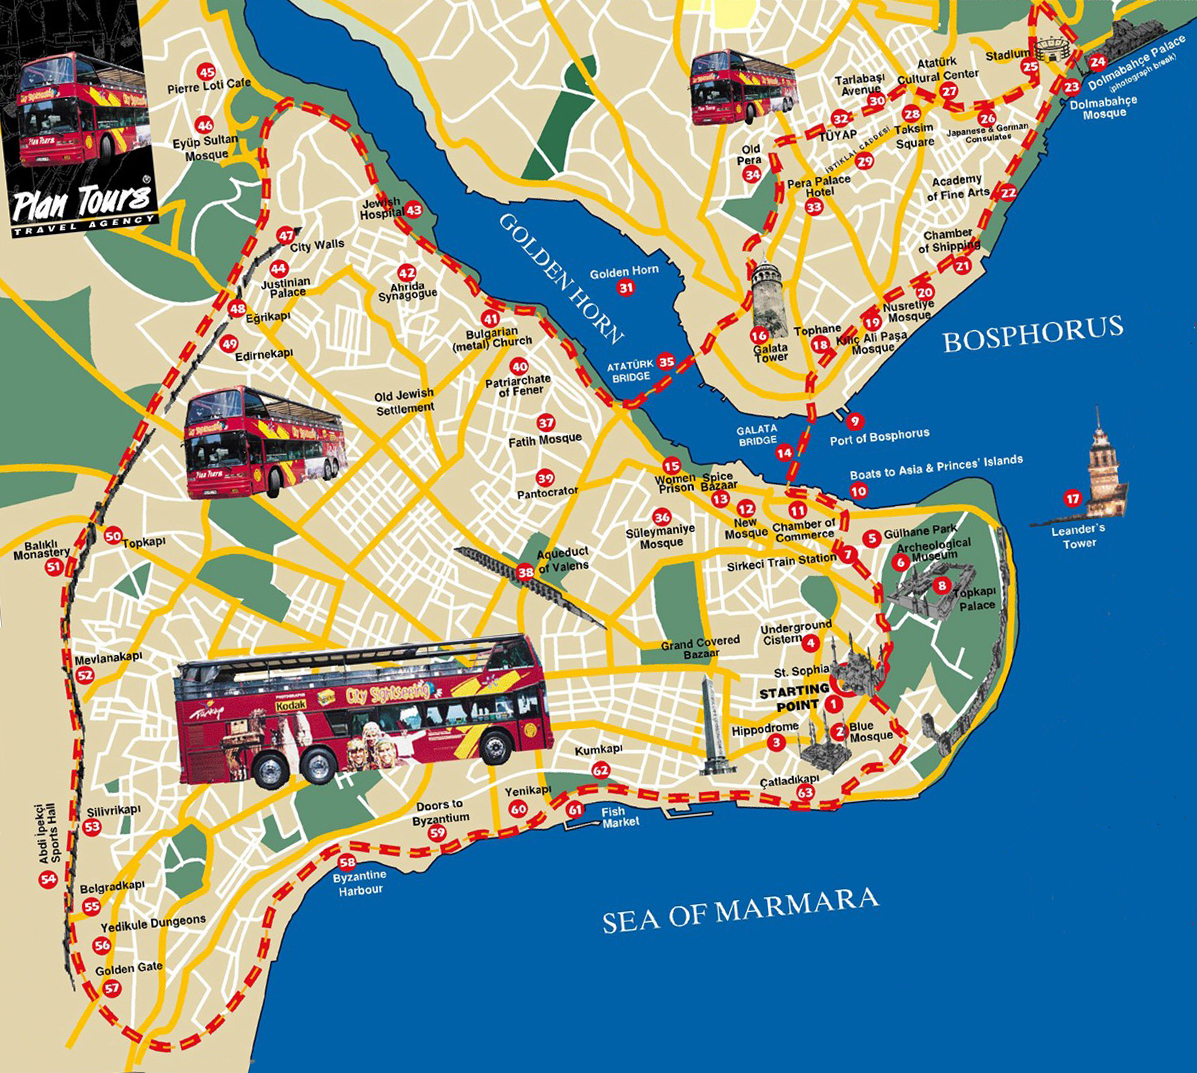 Карта Стамбула на русском языке Карта метро Стамбула на